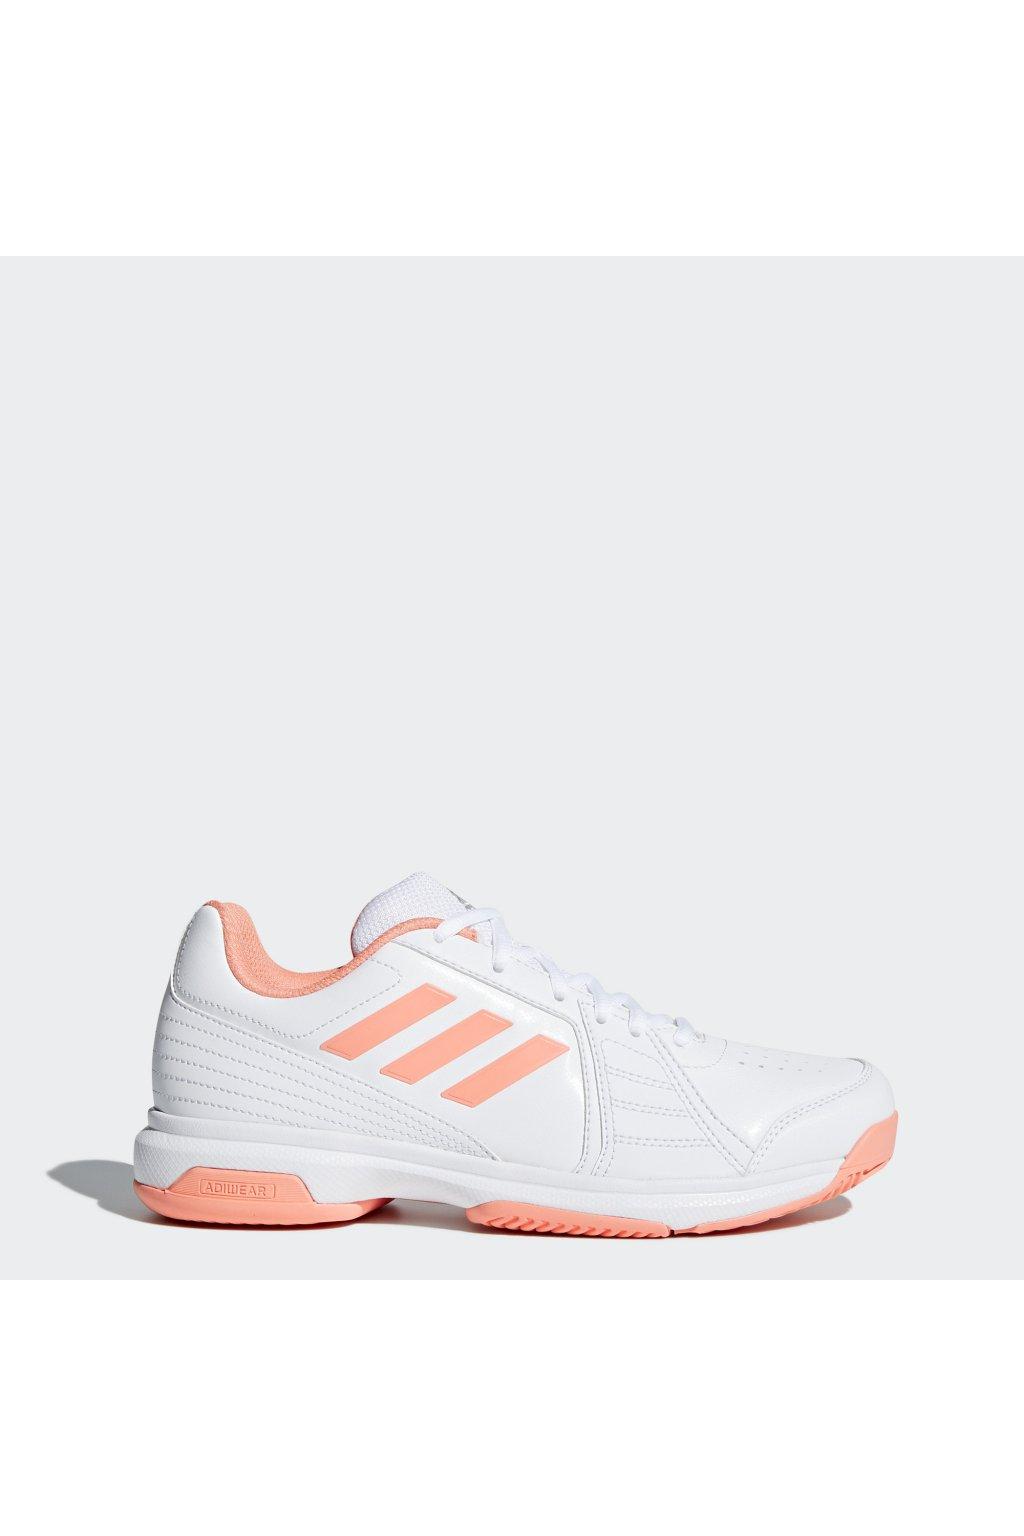 tenisove topanky adidas aspire cm7760 (1)